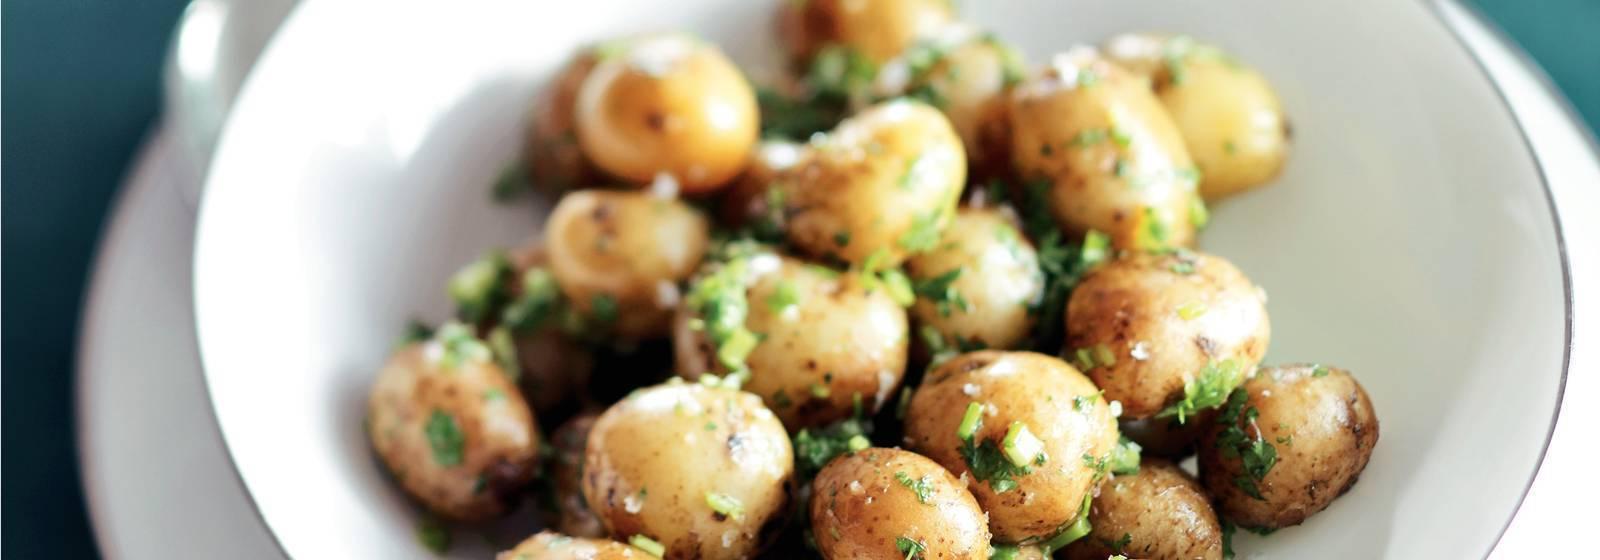 Ot tereyağı ile bebek patates